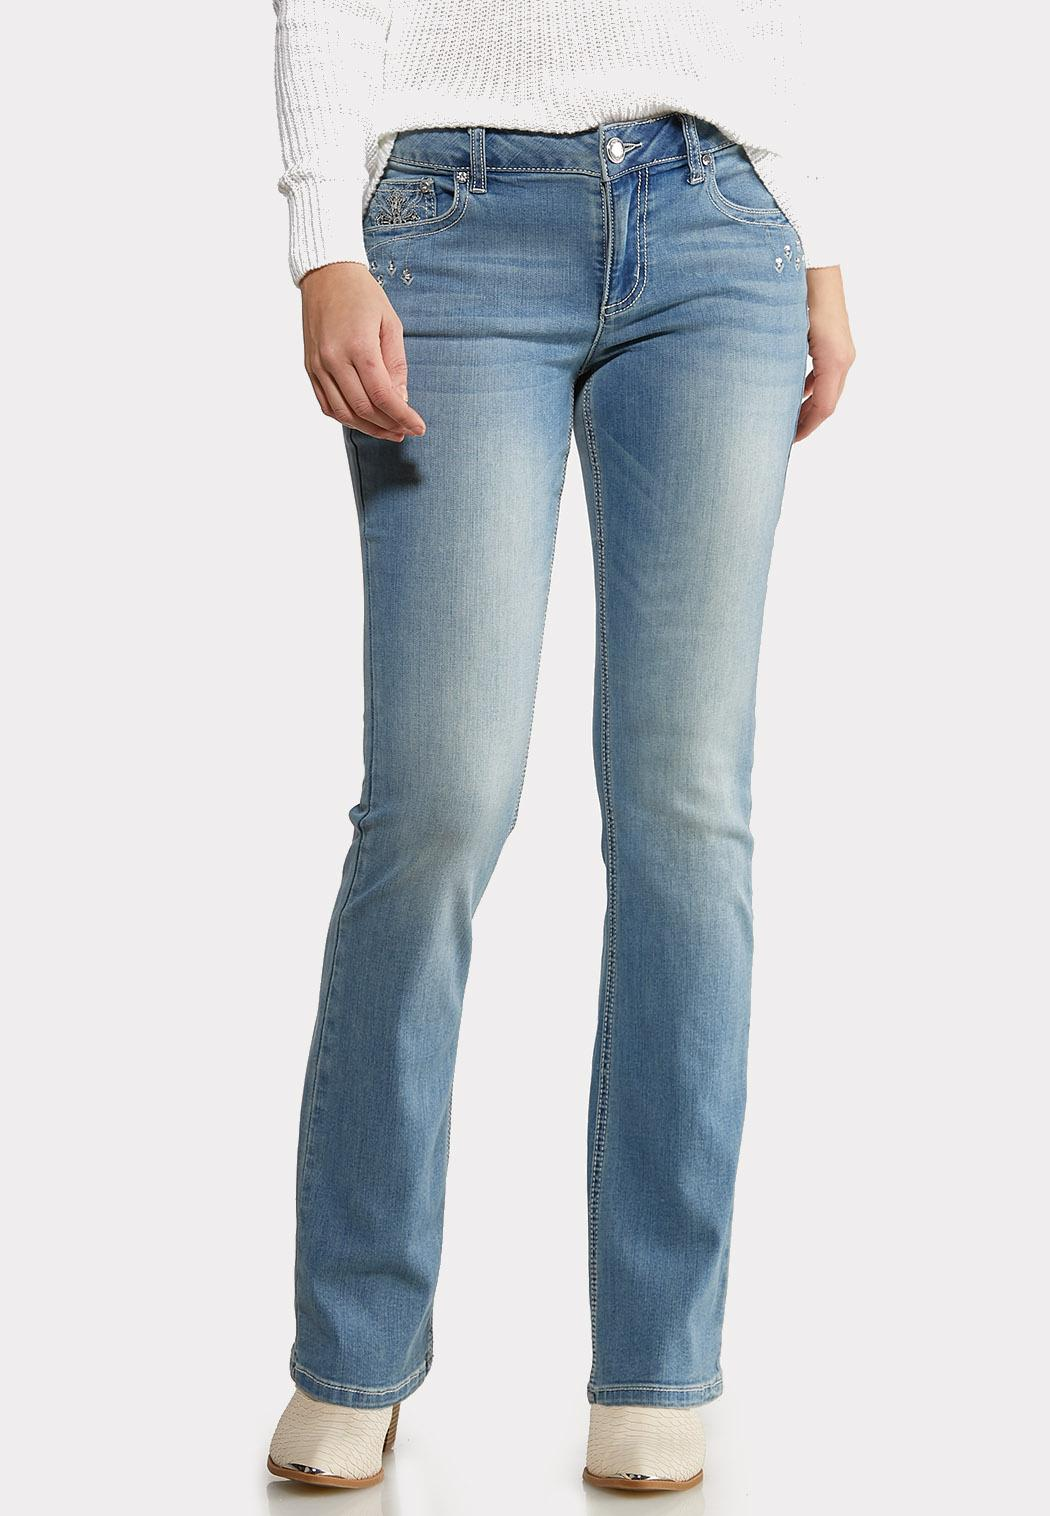 Petite Cross Pocket Jeans (Item #44097733)